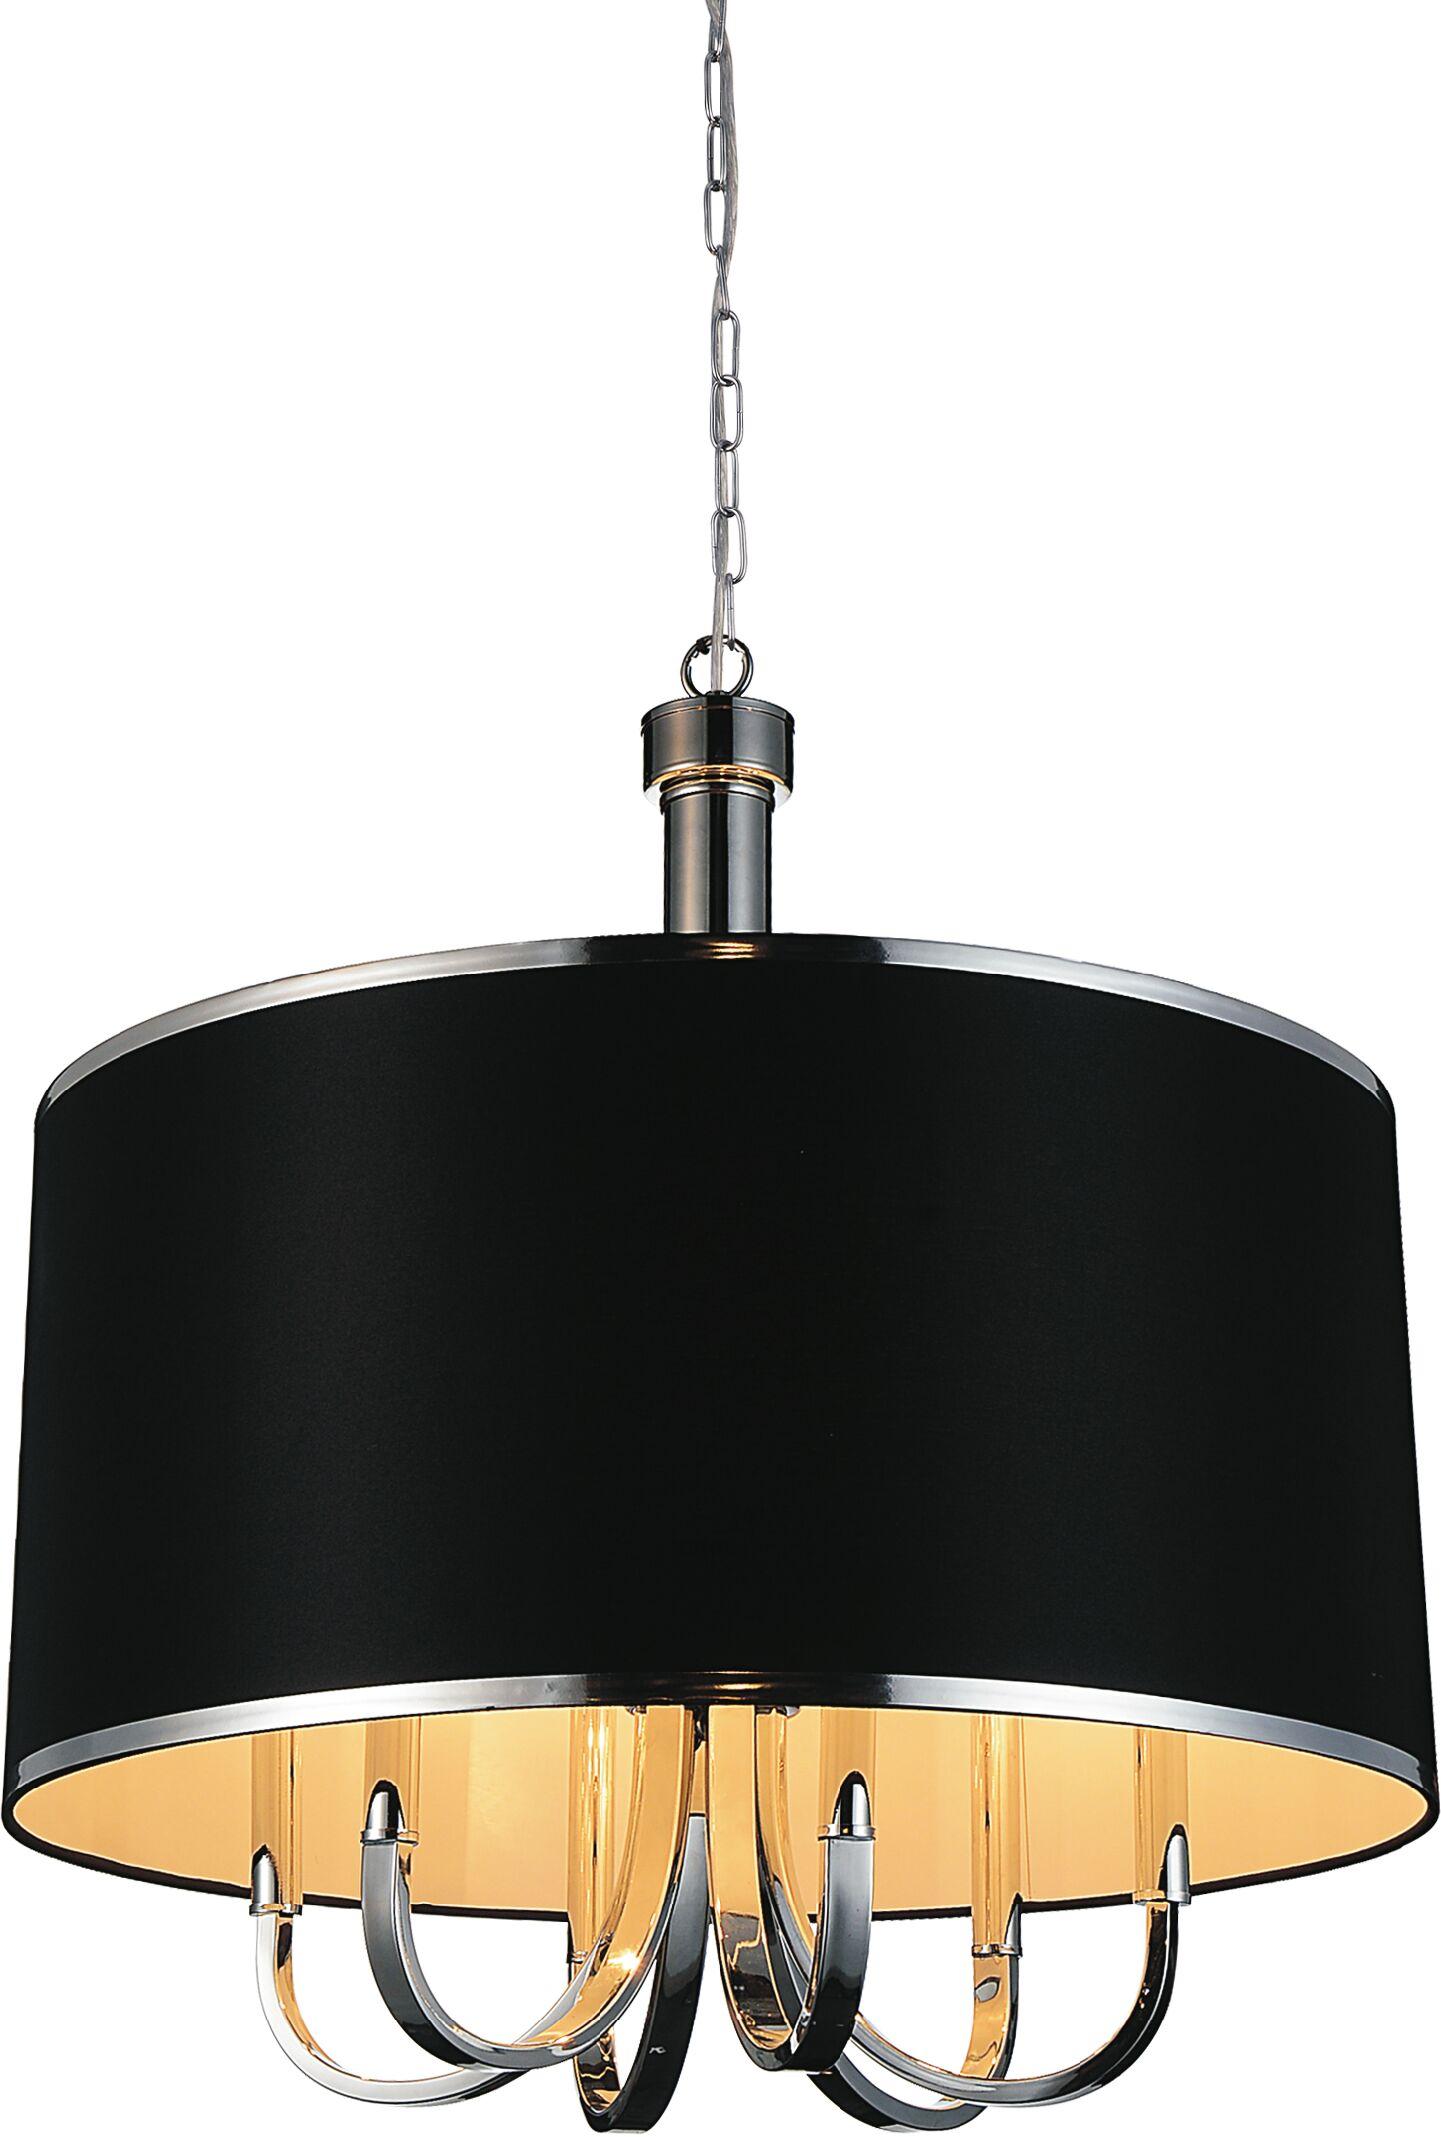 Orchid 6-Light Chandelier Shade Color: Black